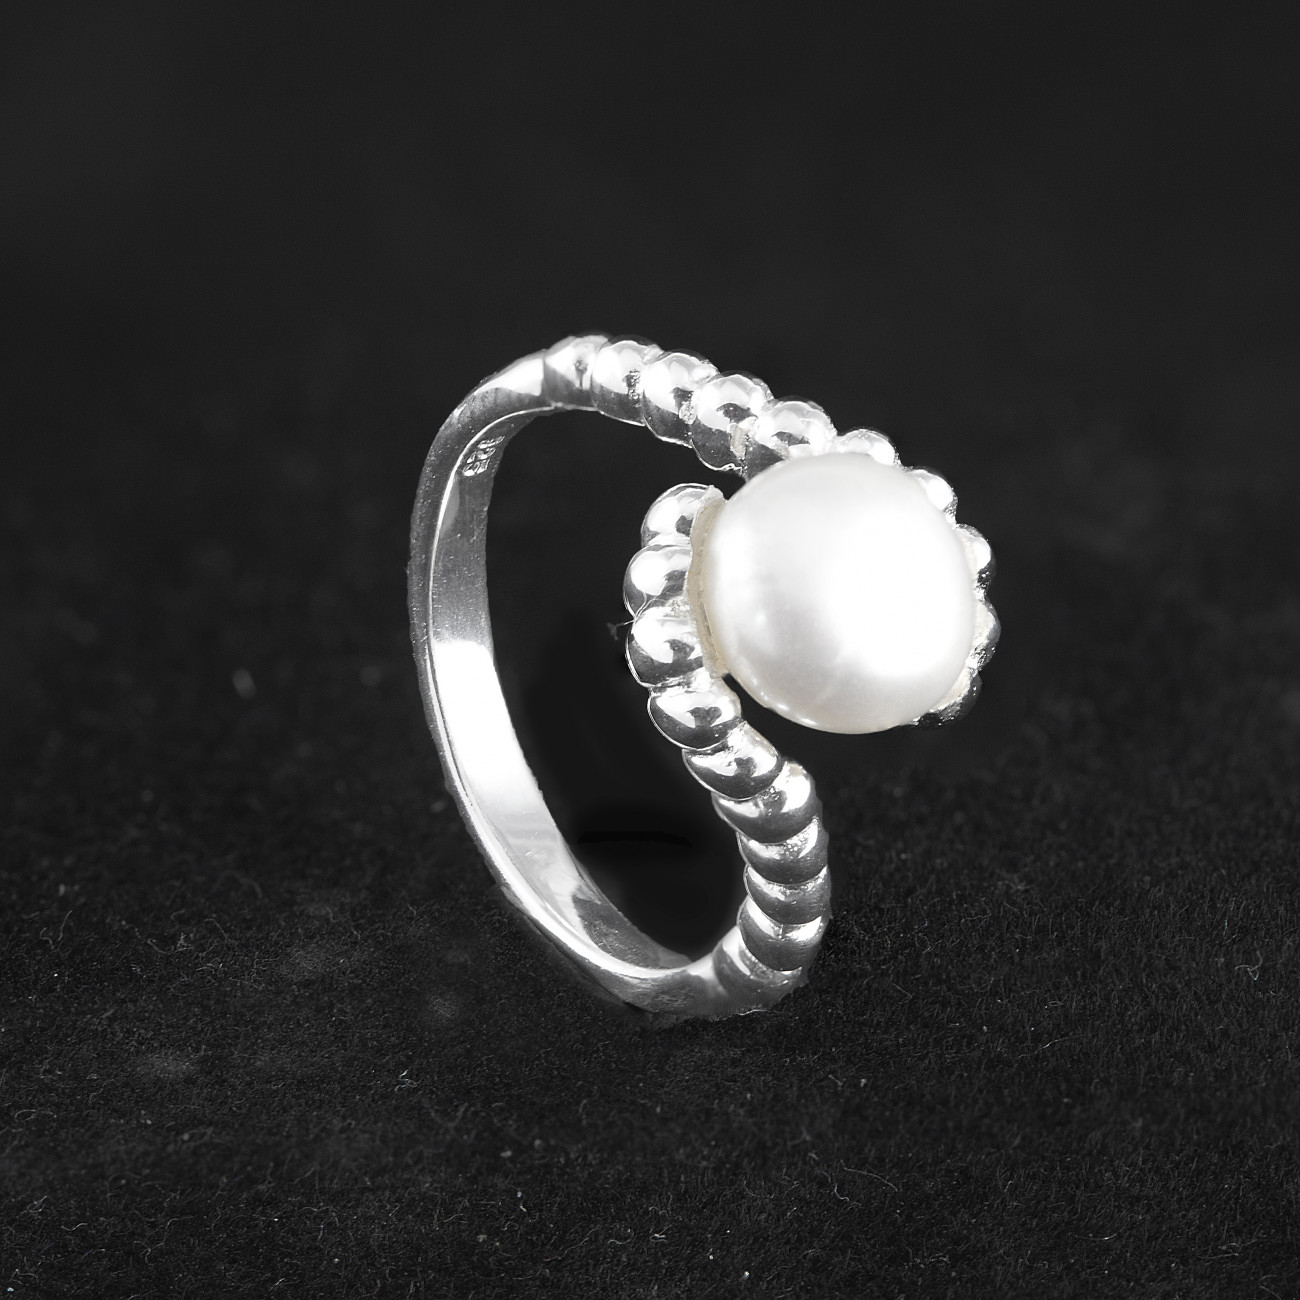 Stříbrný prsten s pravou perlou